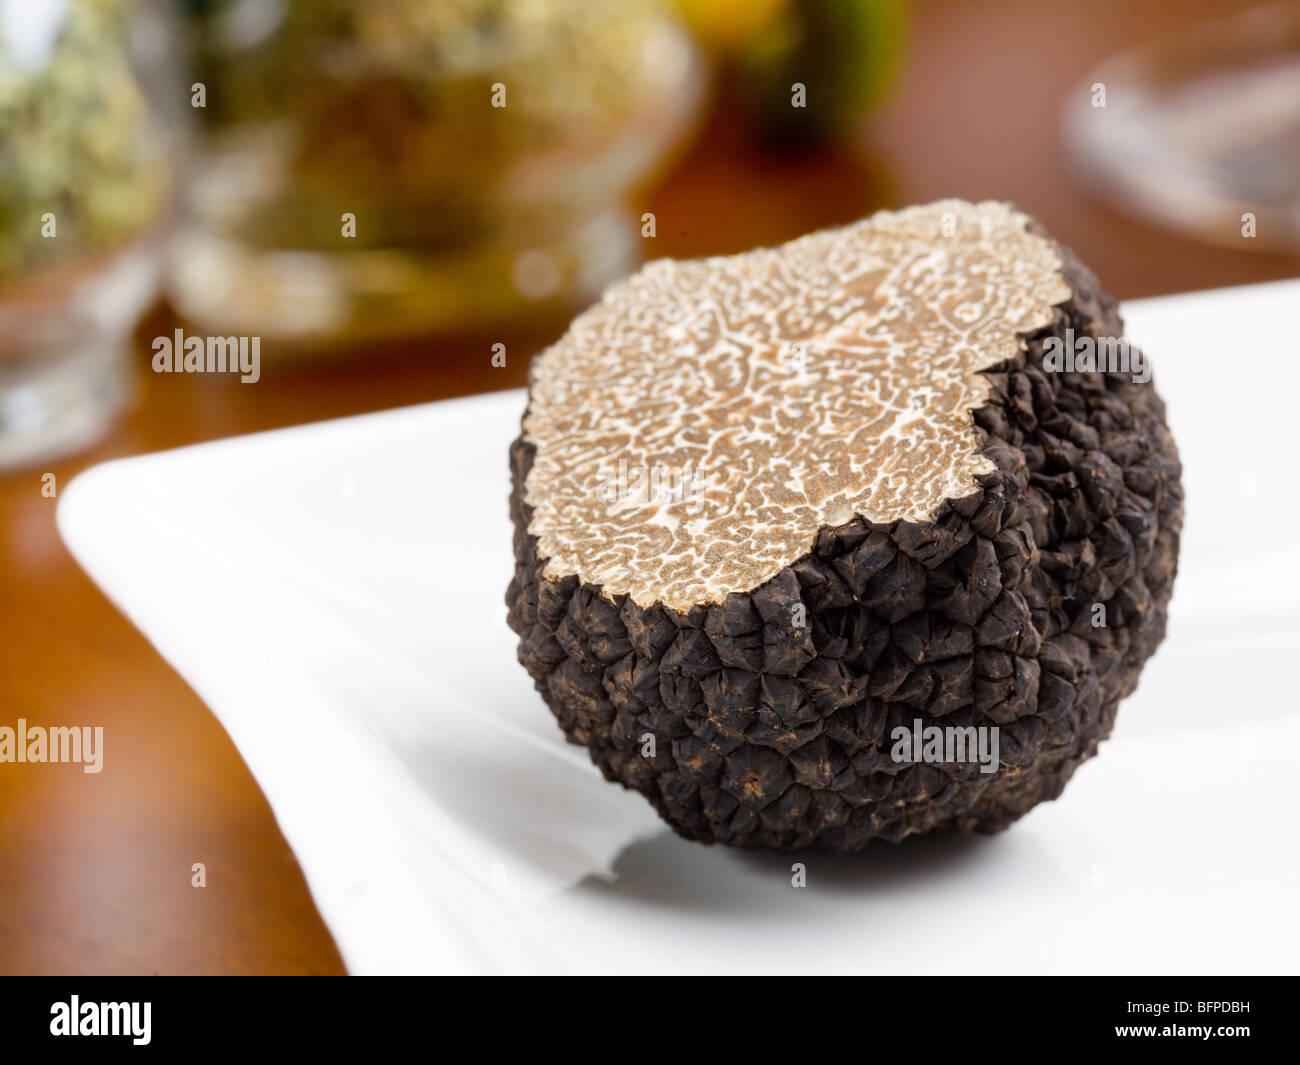 Mushroom of truffle on a white dish - Stock Image